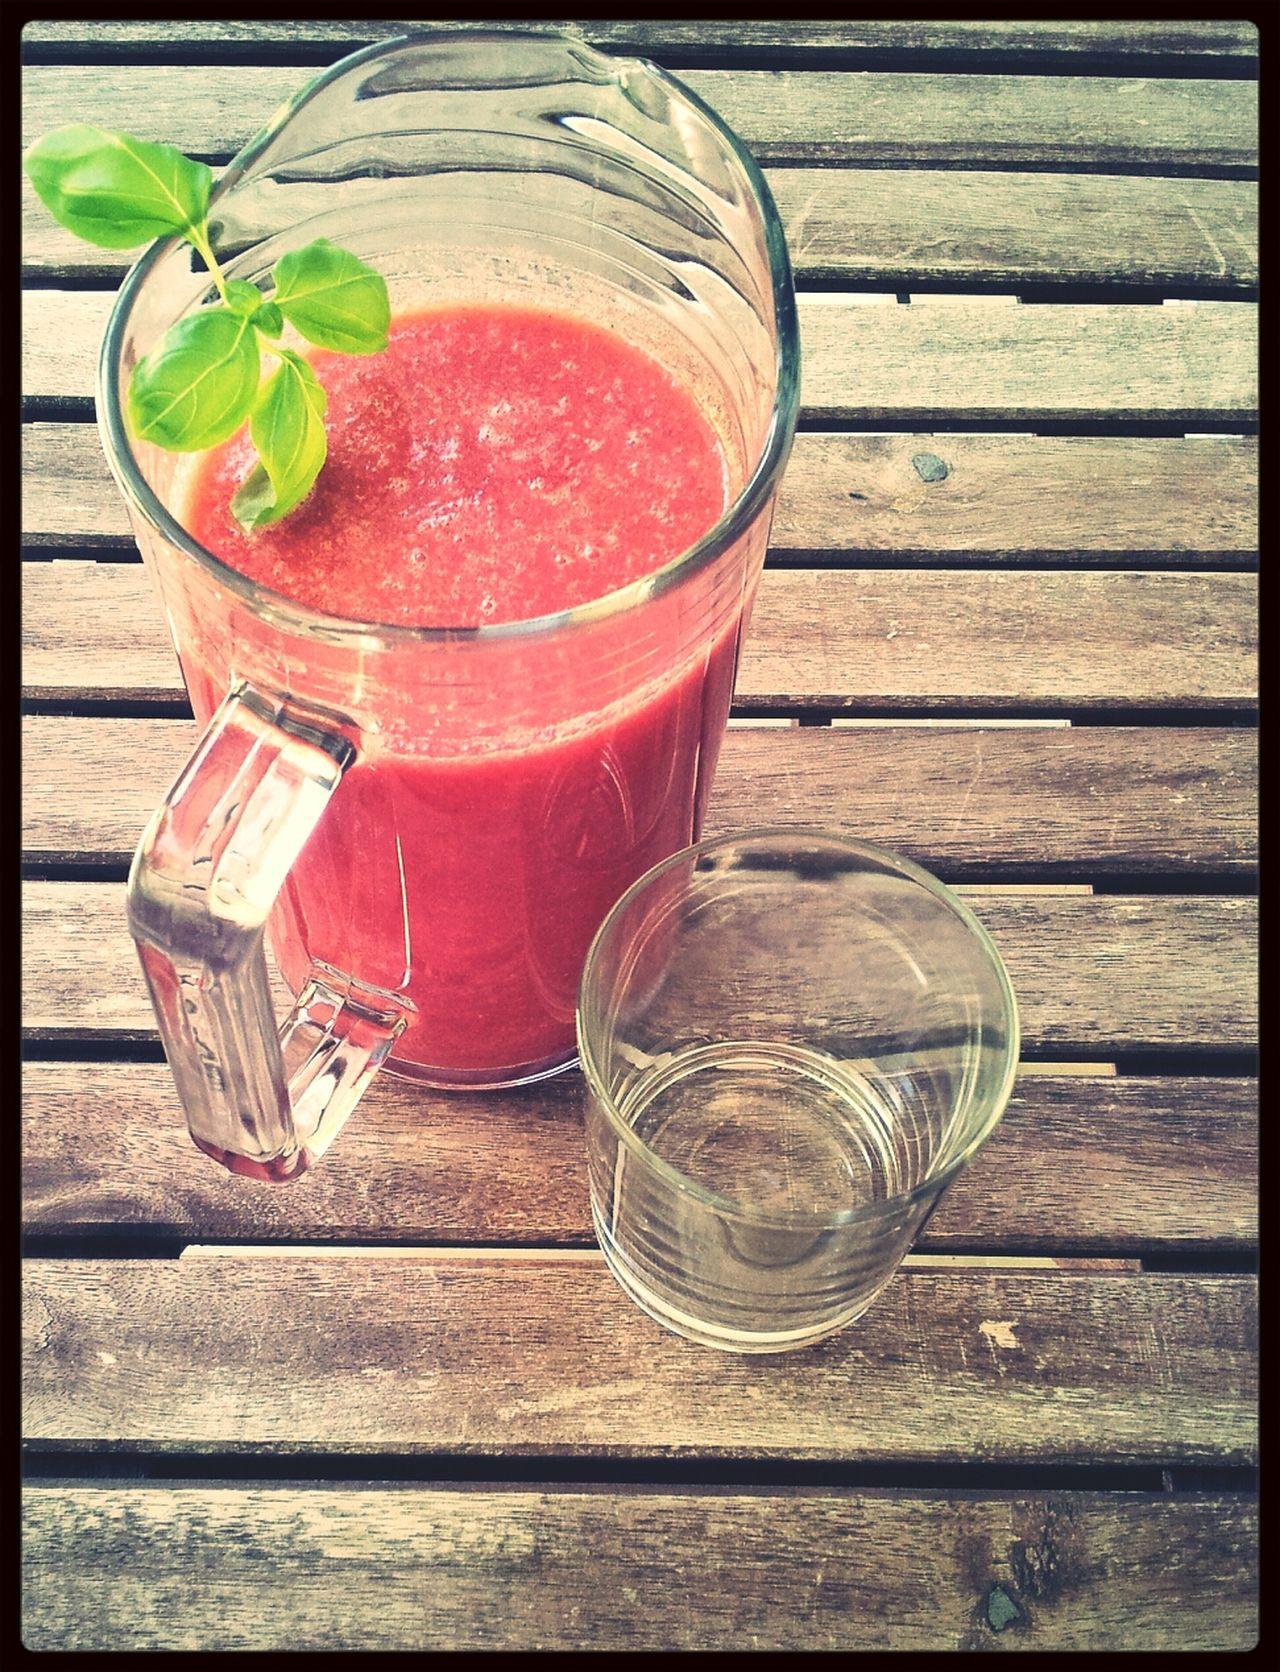 strawberry-watermelon-smoothie On My Balcony Relaxing The EyeEm Breakfast Club